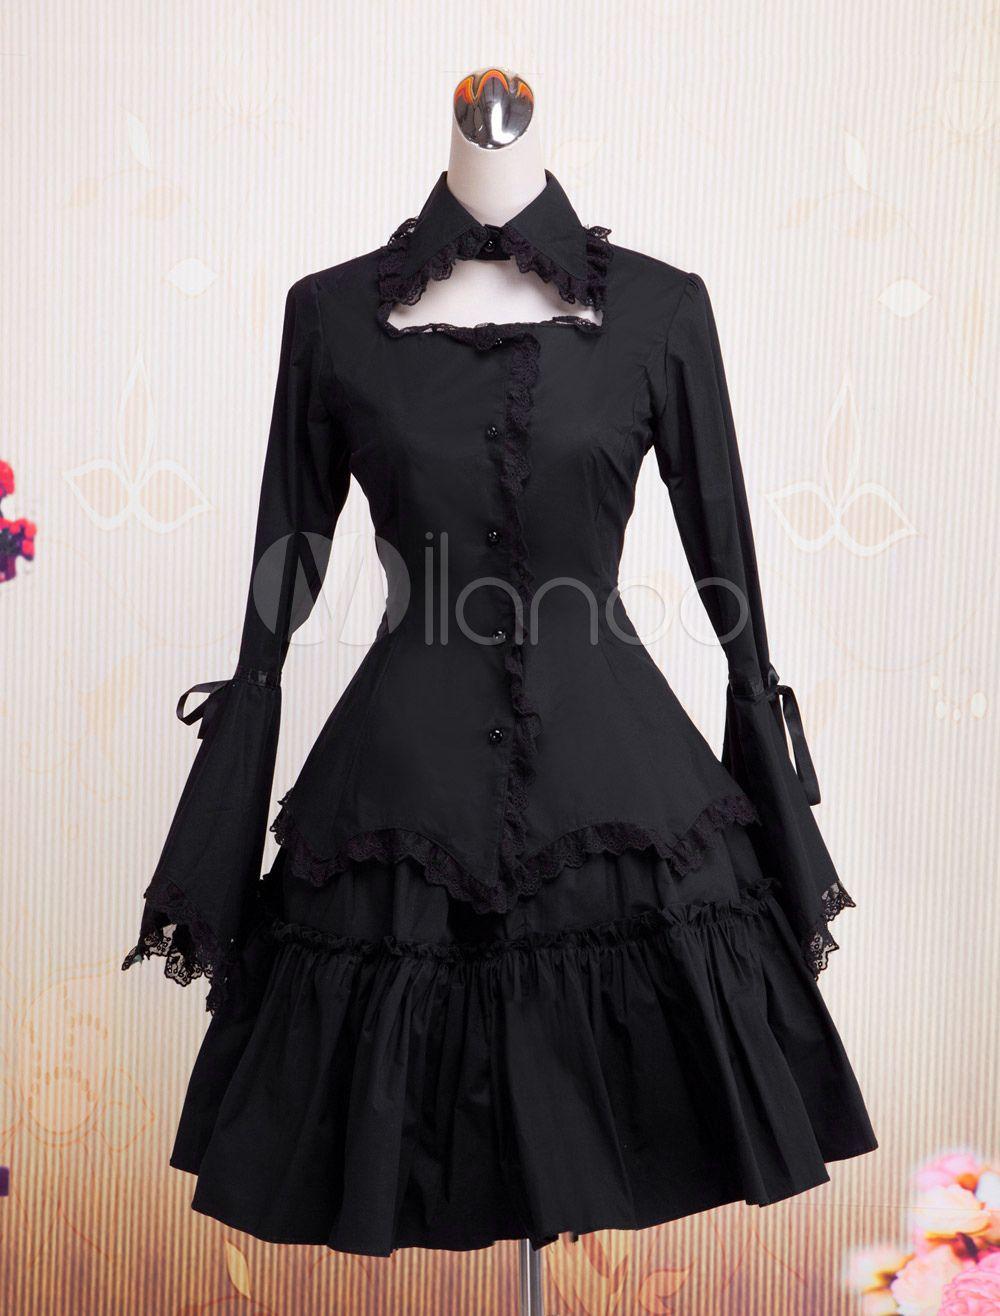 Gothic lolita dress op black long hime sleeves ruffles lace trim